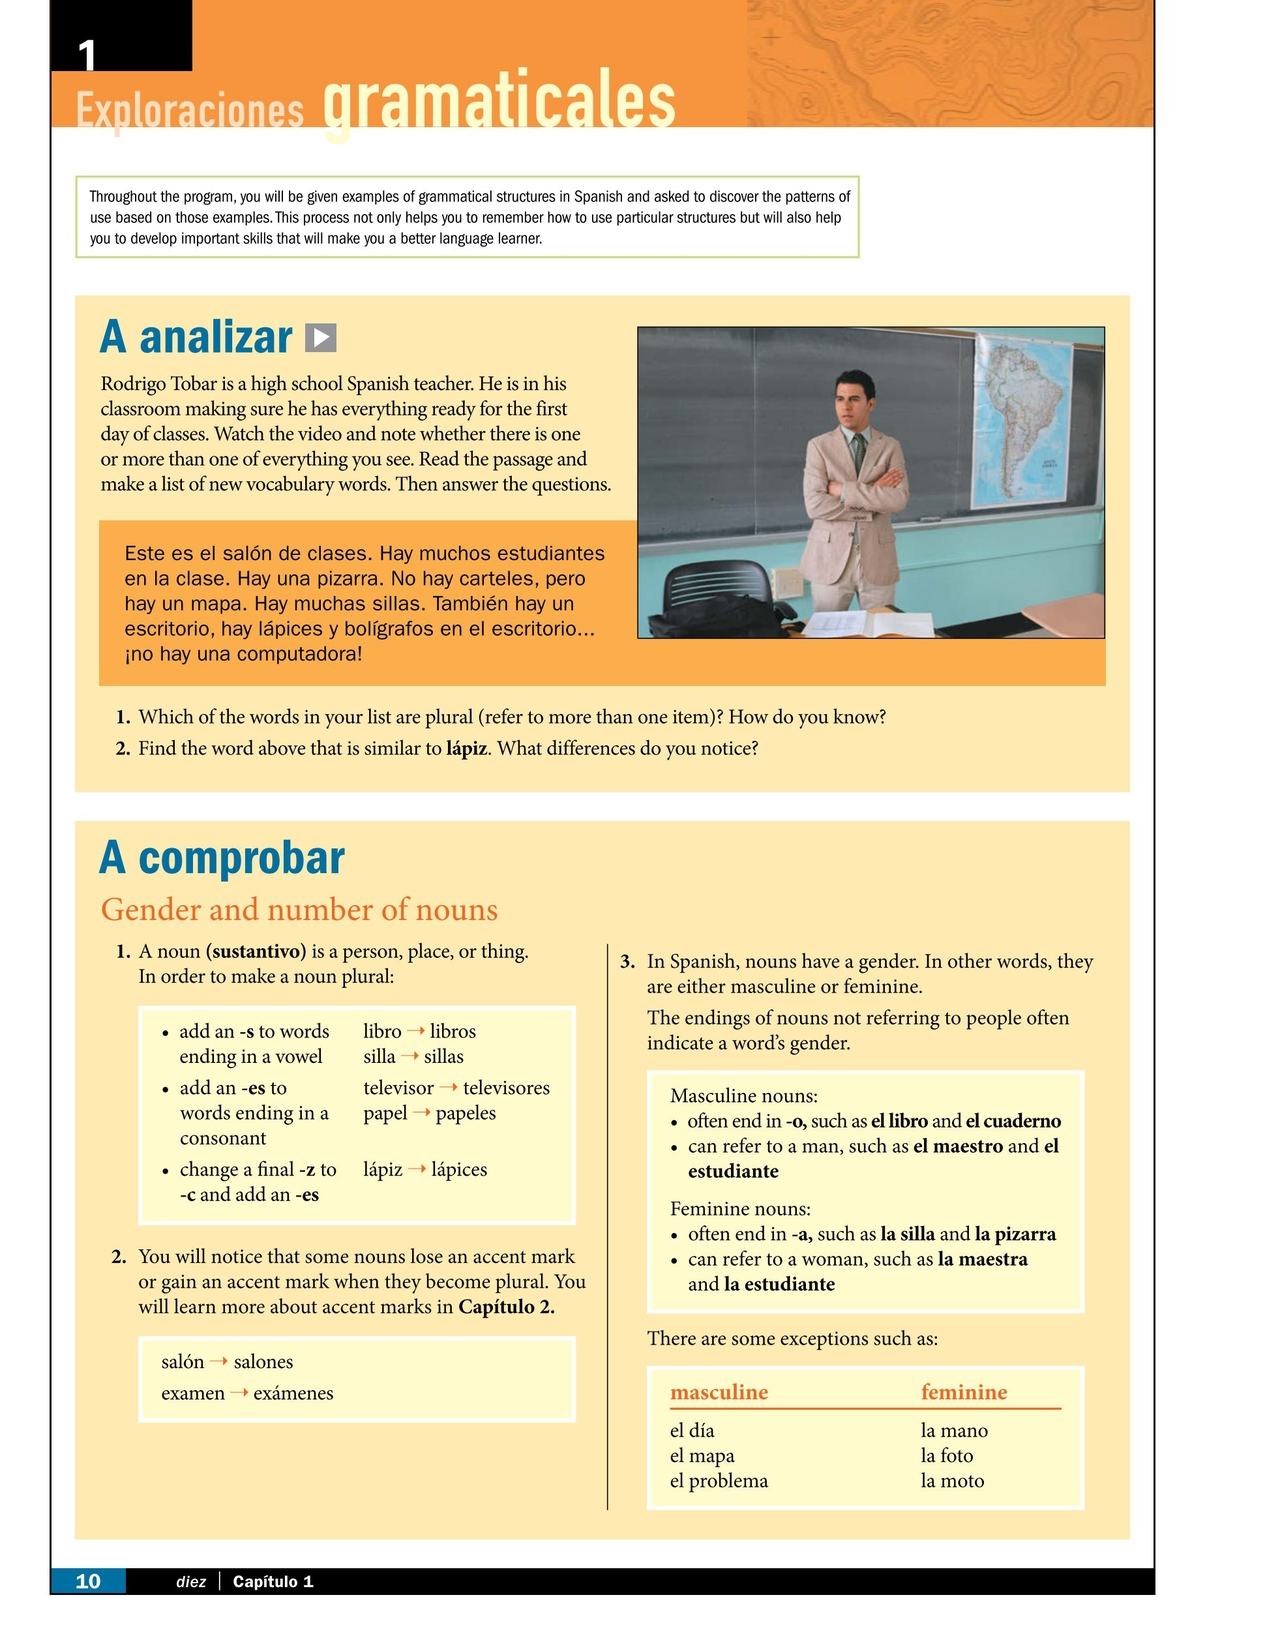 Exploremos Sampler - Levels 1 and 3